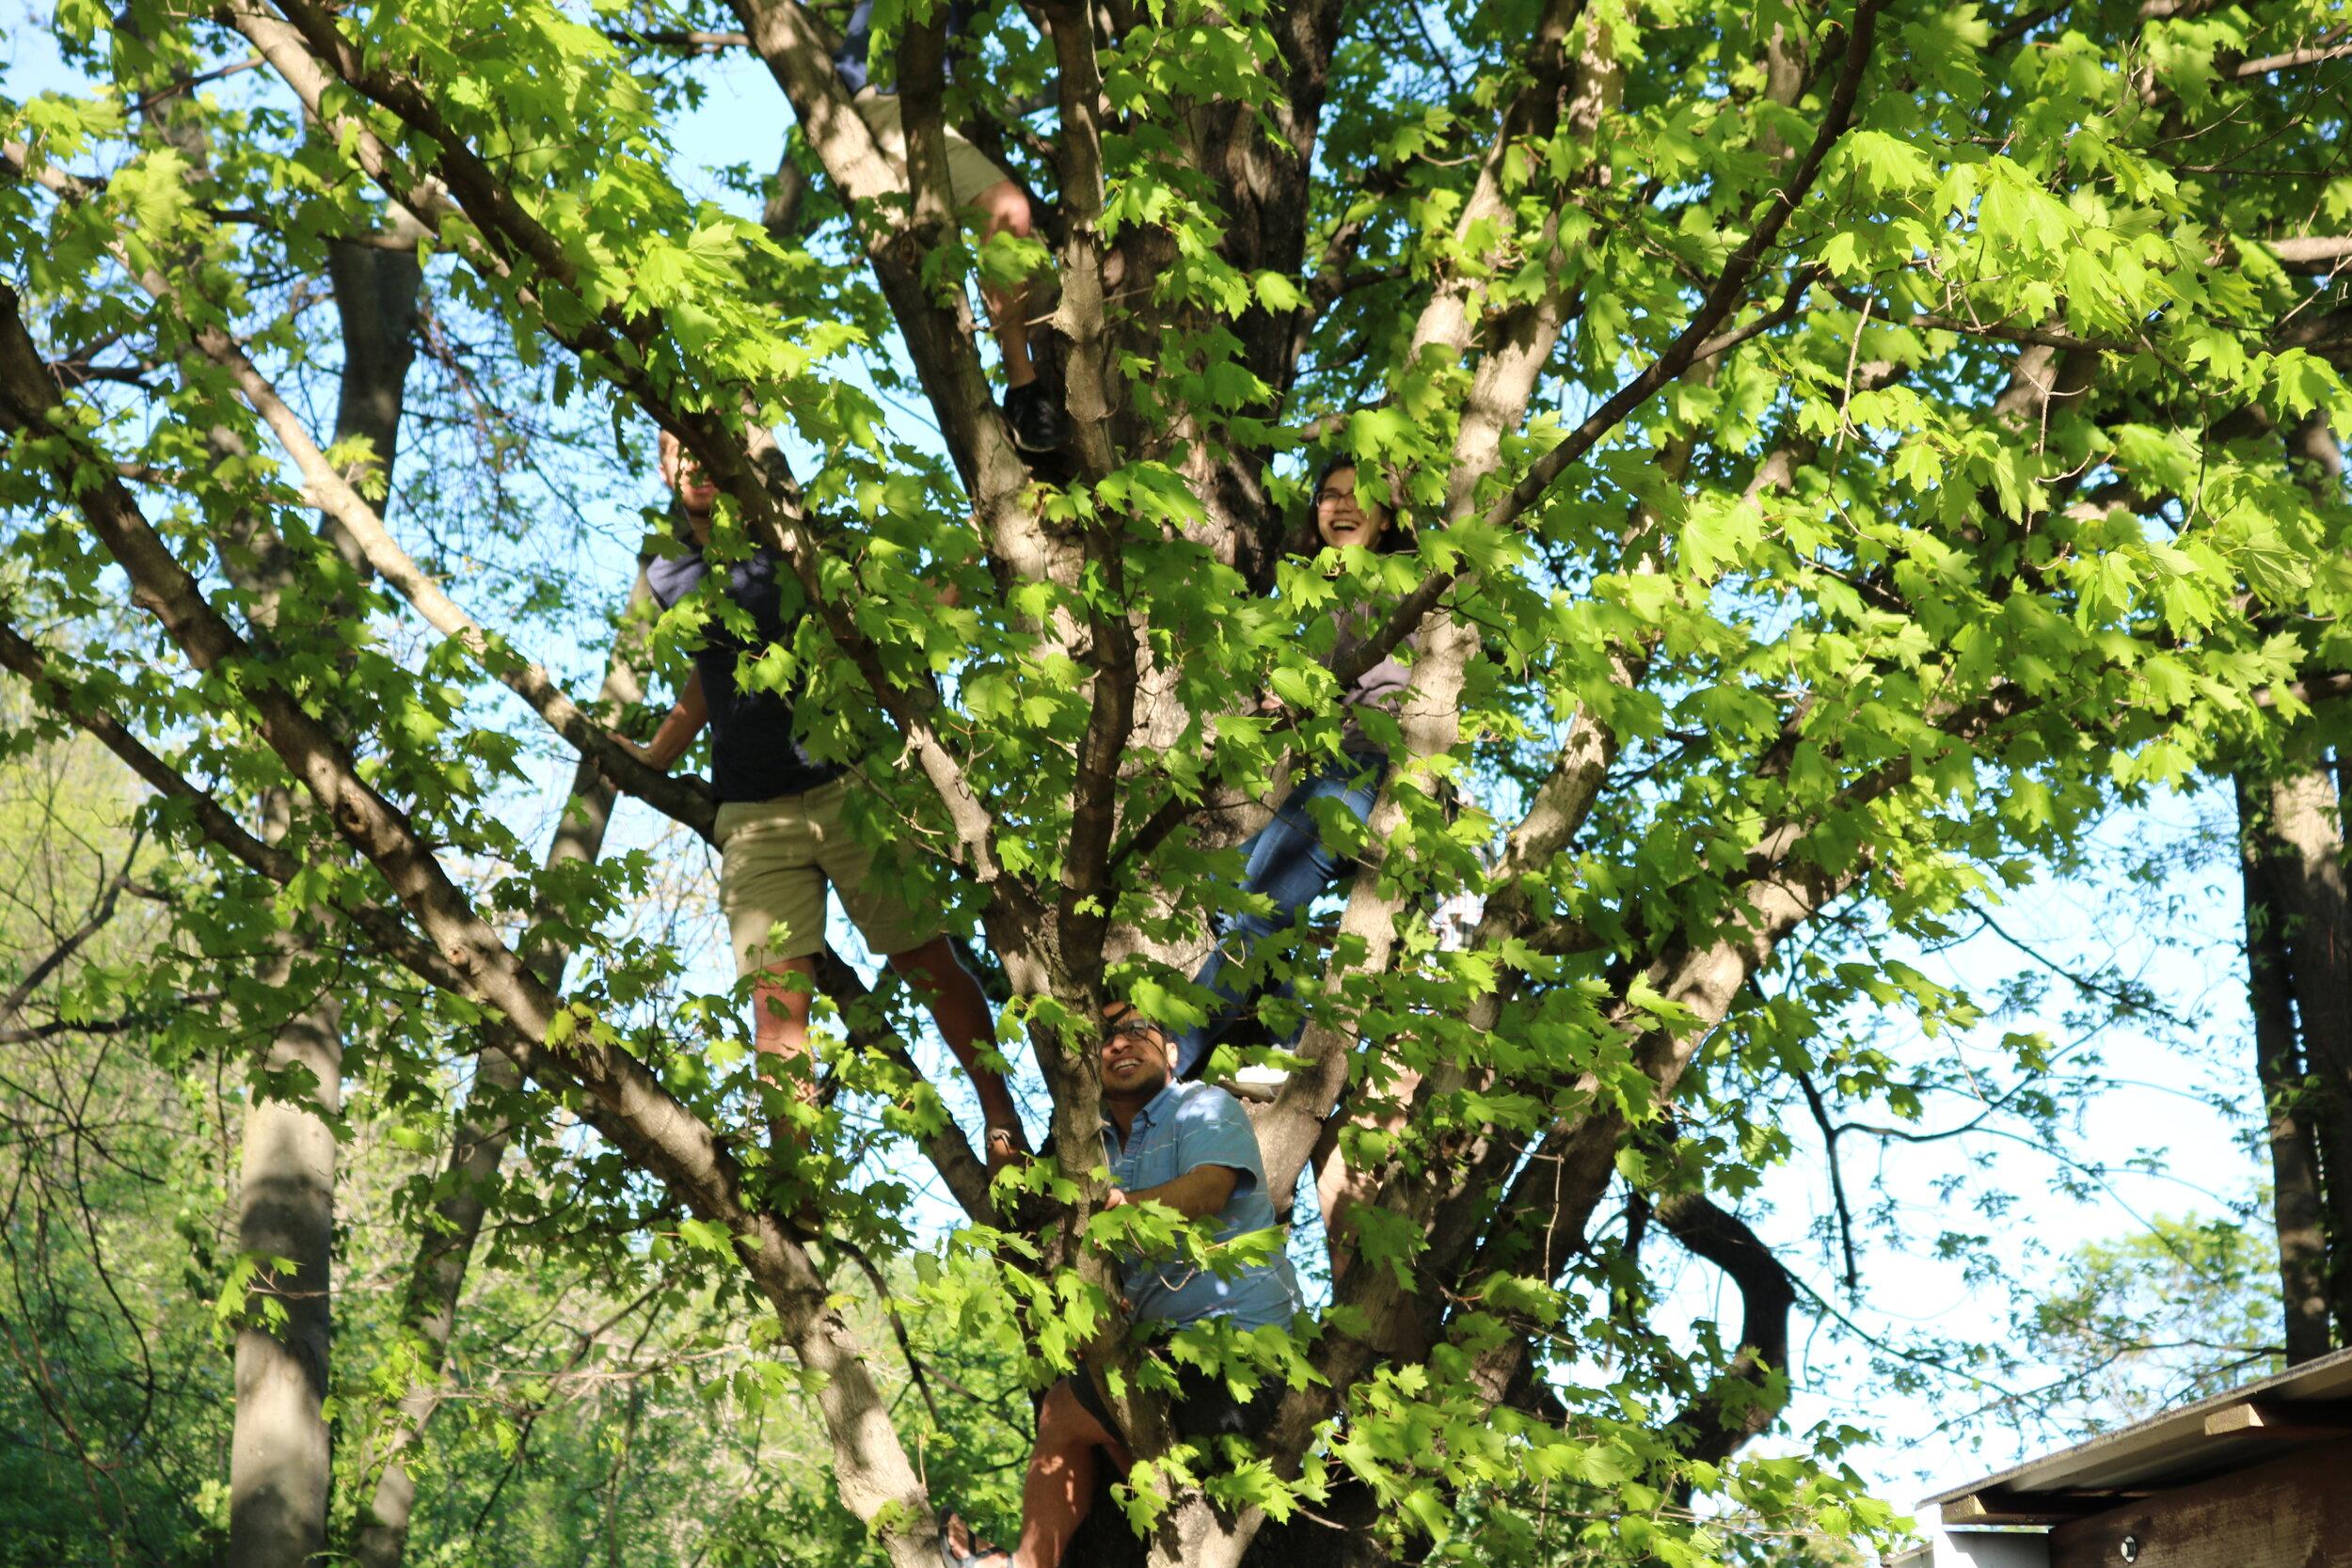 Tree-climbing, a favorite pastime among SyBBUREites.